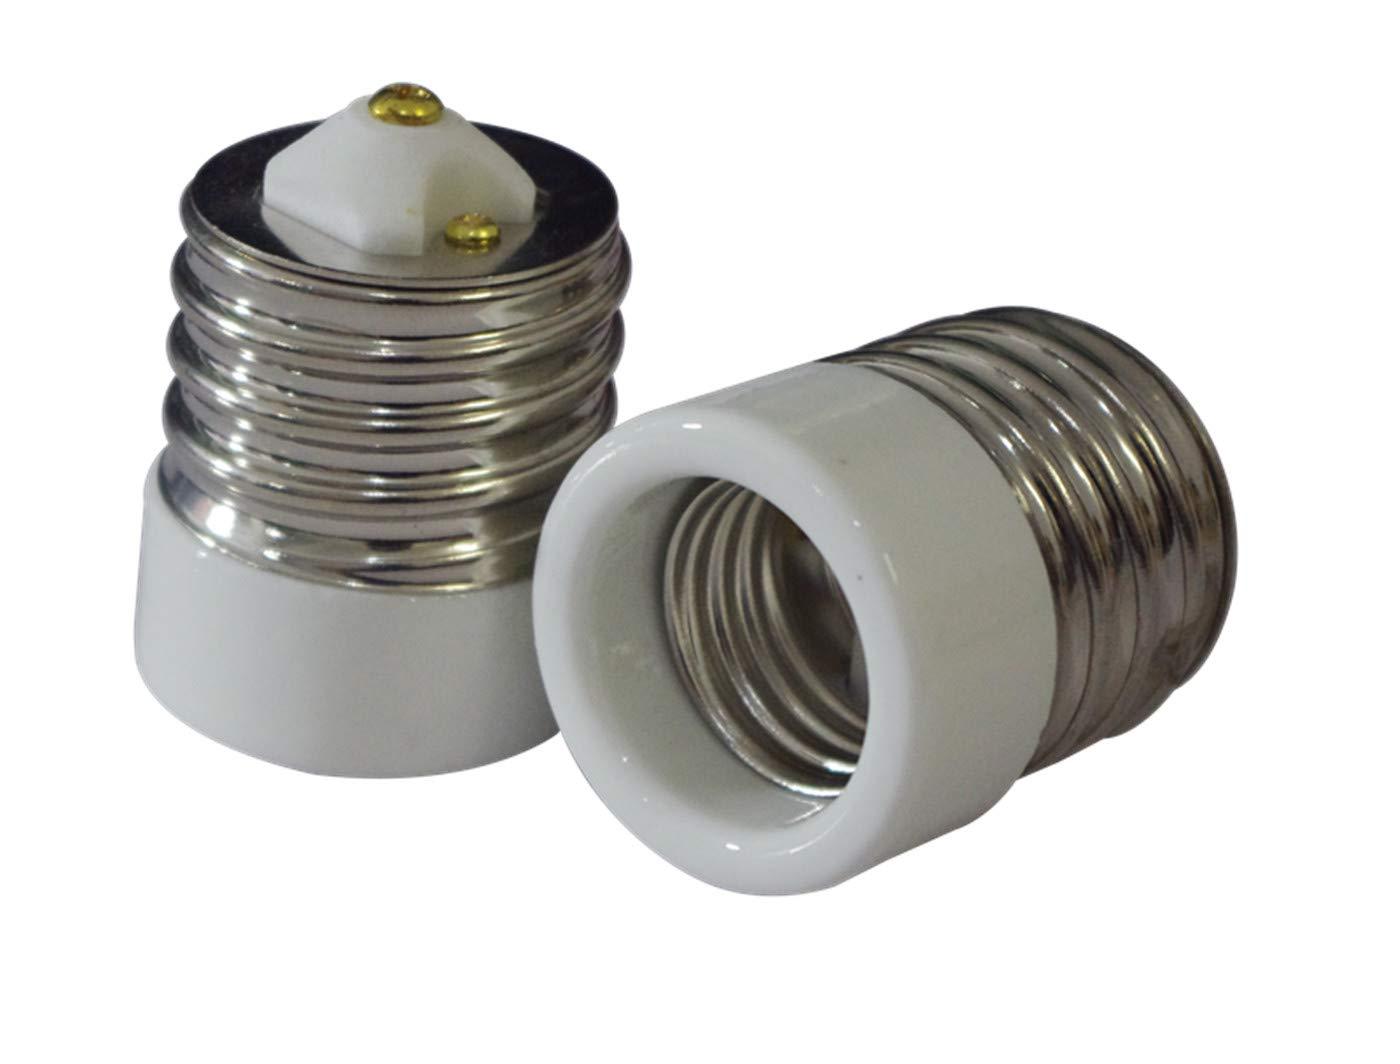 2 Packs Ali Tronics E39 to E26 Adapter (Mogul Base E39 to Medium Base E26), UL Listed,Ceramic Material-high Voltage and High Temperature Resistant